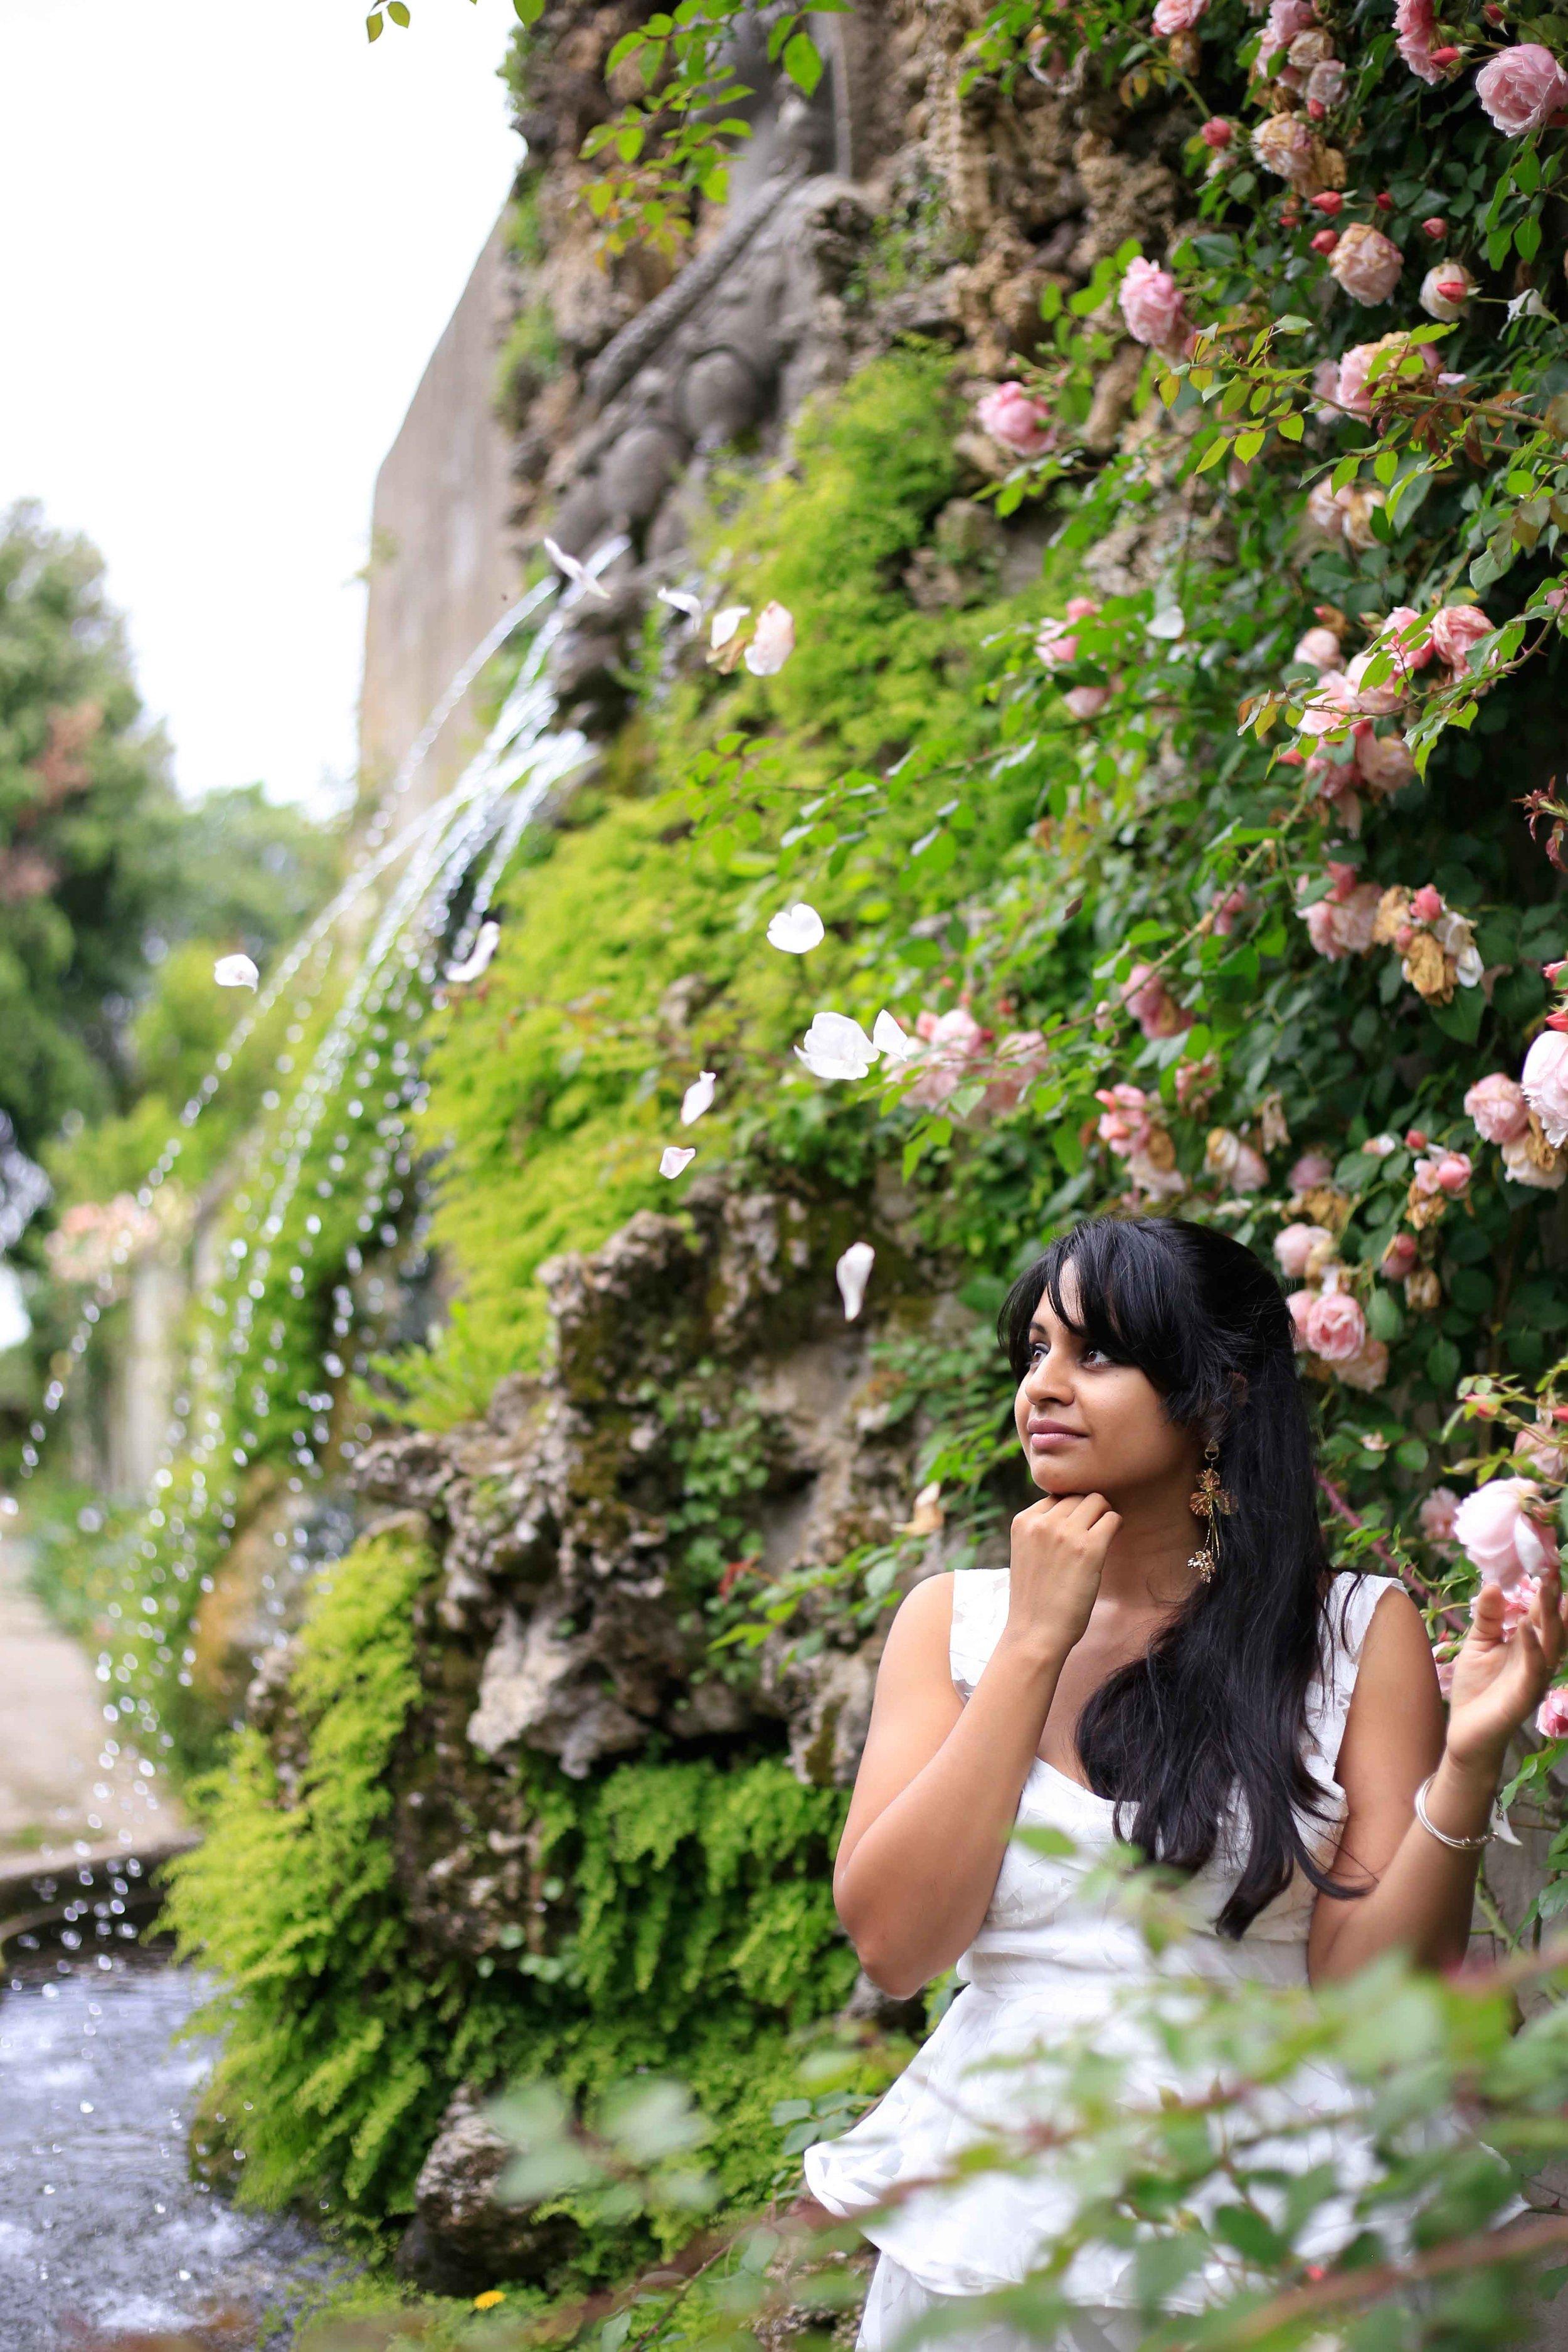 Just admiring the endless roses in Tivoli Gardens (Villa d'Este)